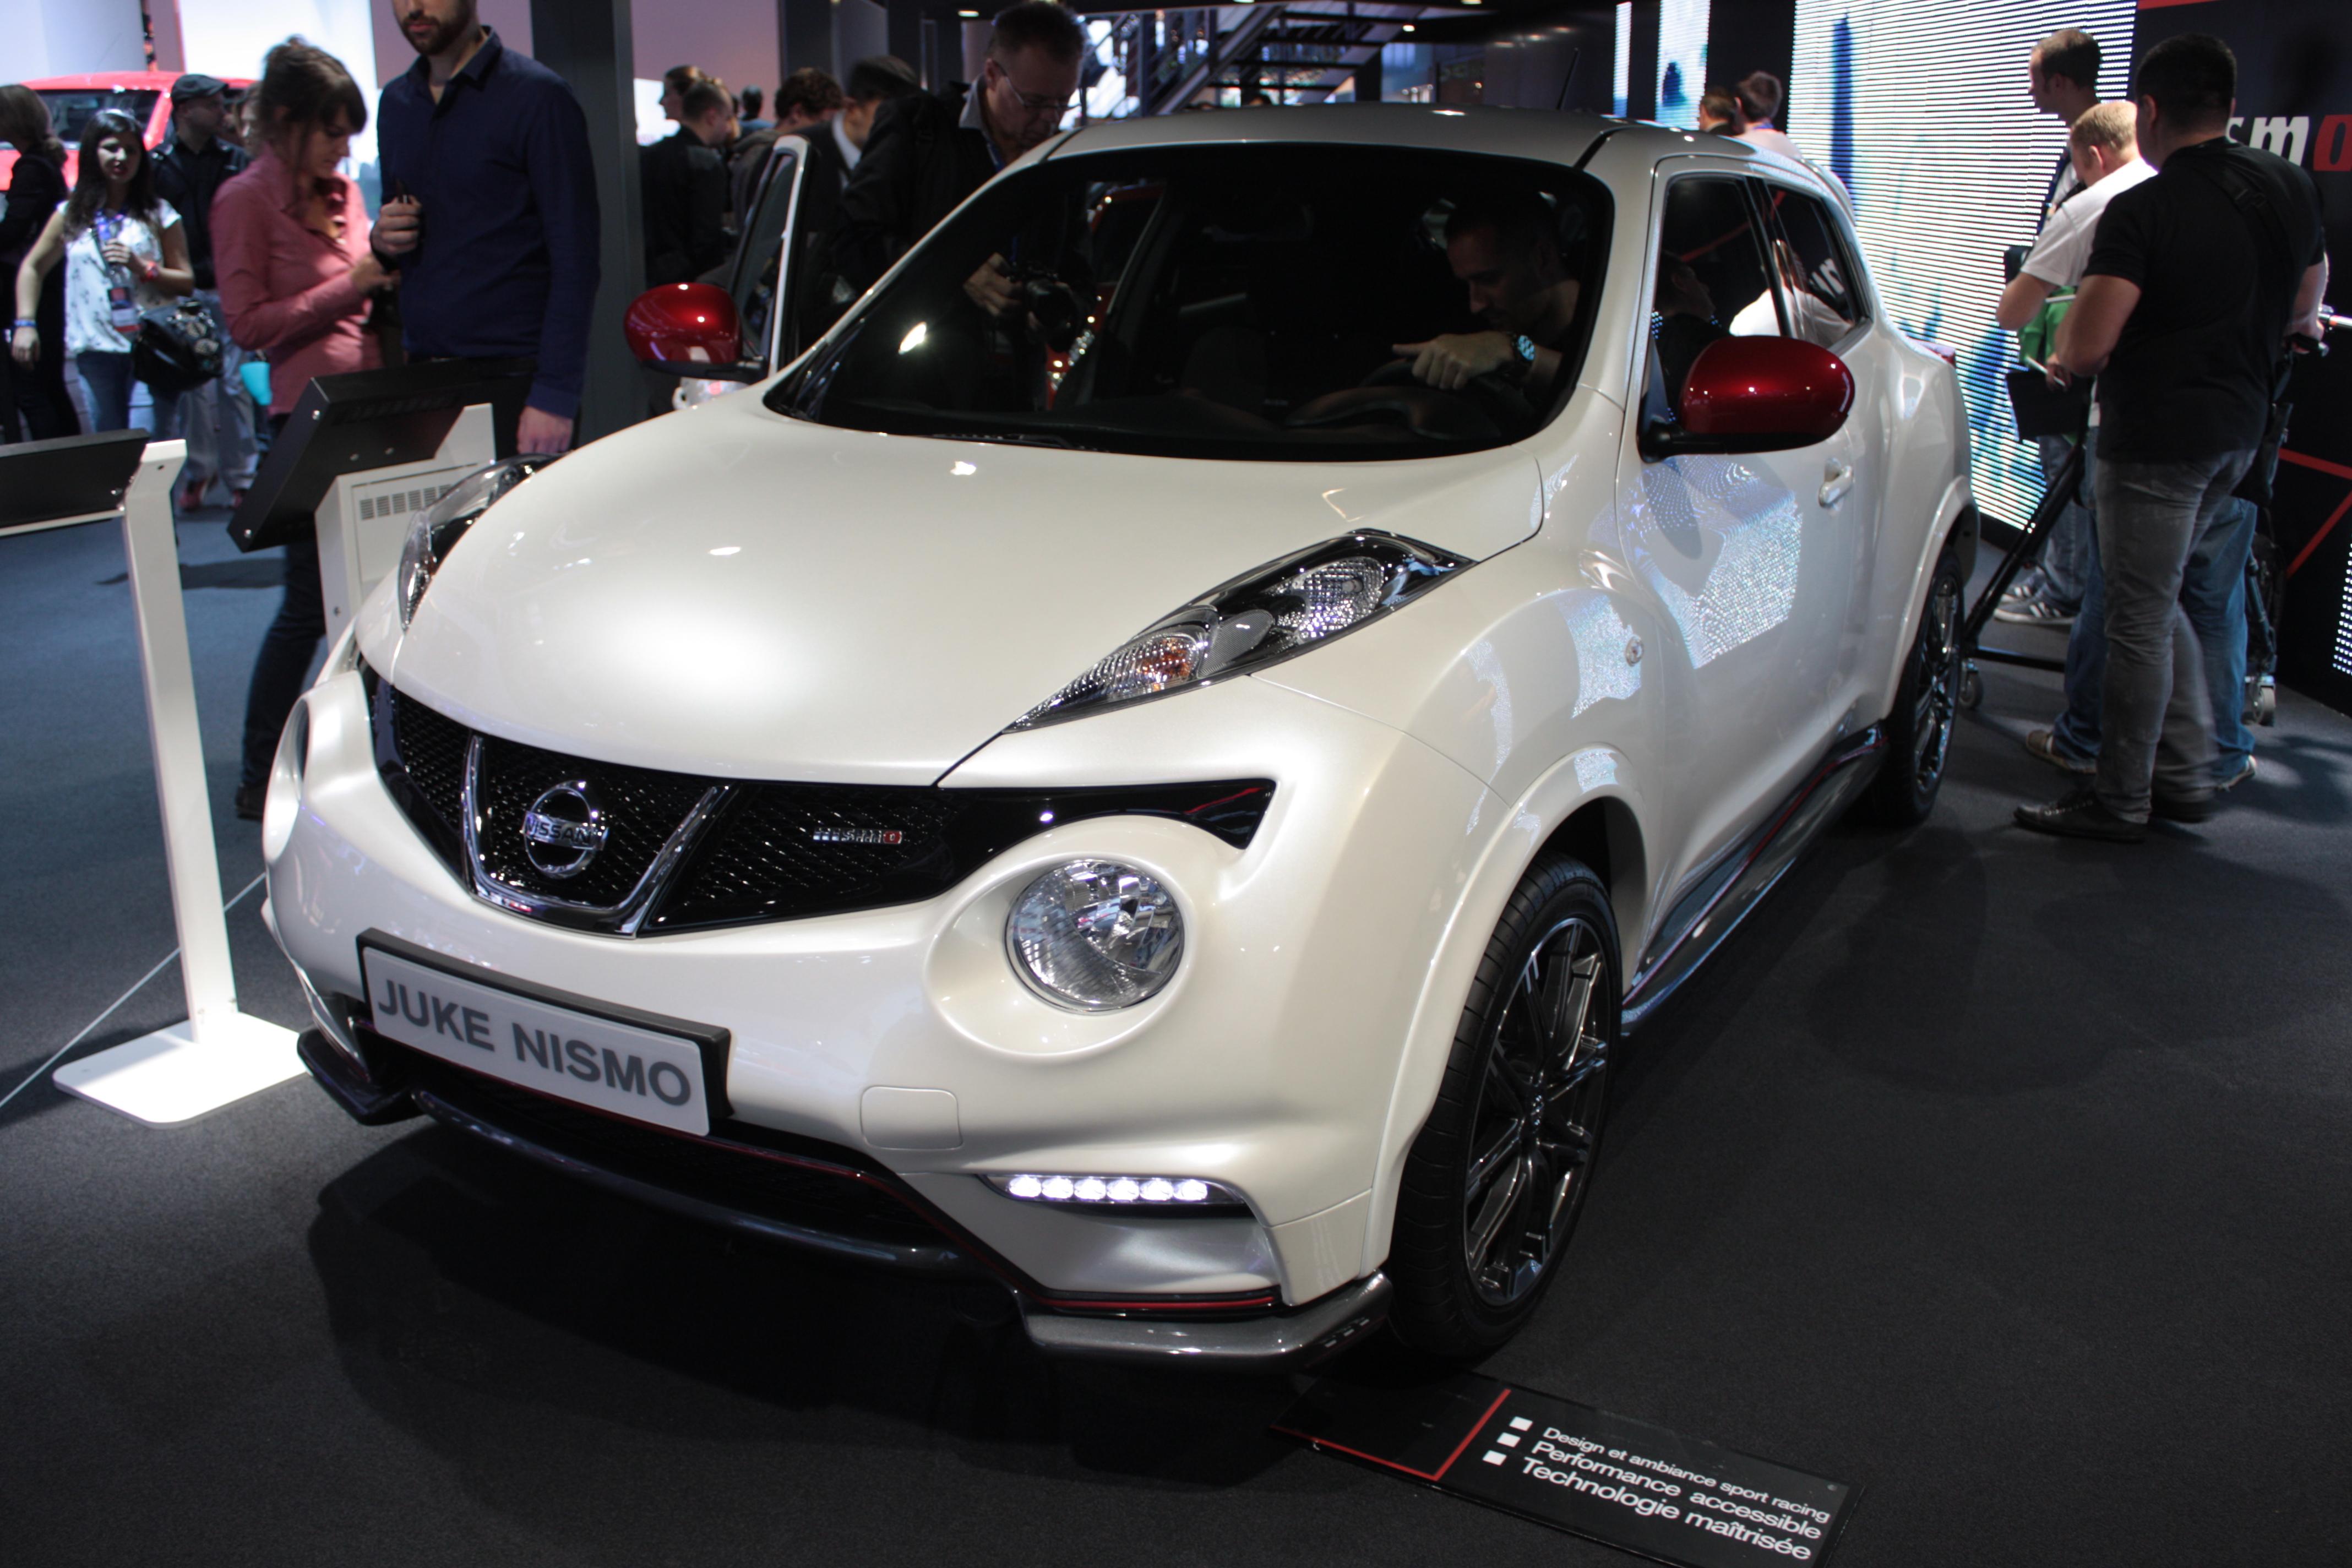 http://images.caradisiac.com/images/1/4/1/8/81418/S0-En-direct-du-Mondial-2012-Nissan-Juke-Nismo-enfin-de-serie-273606.jpg